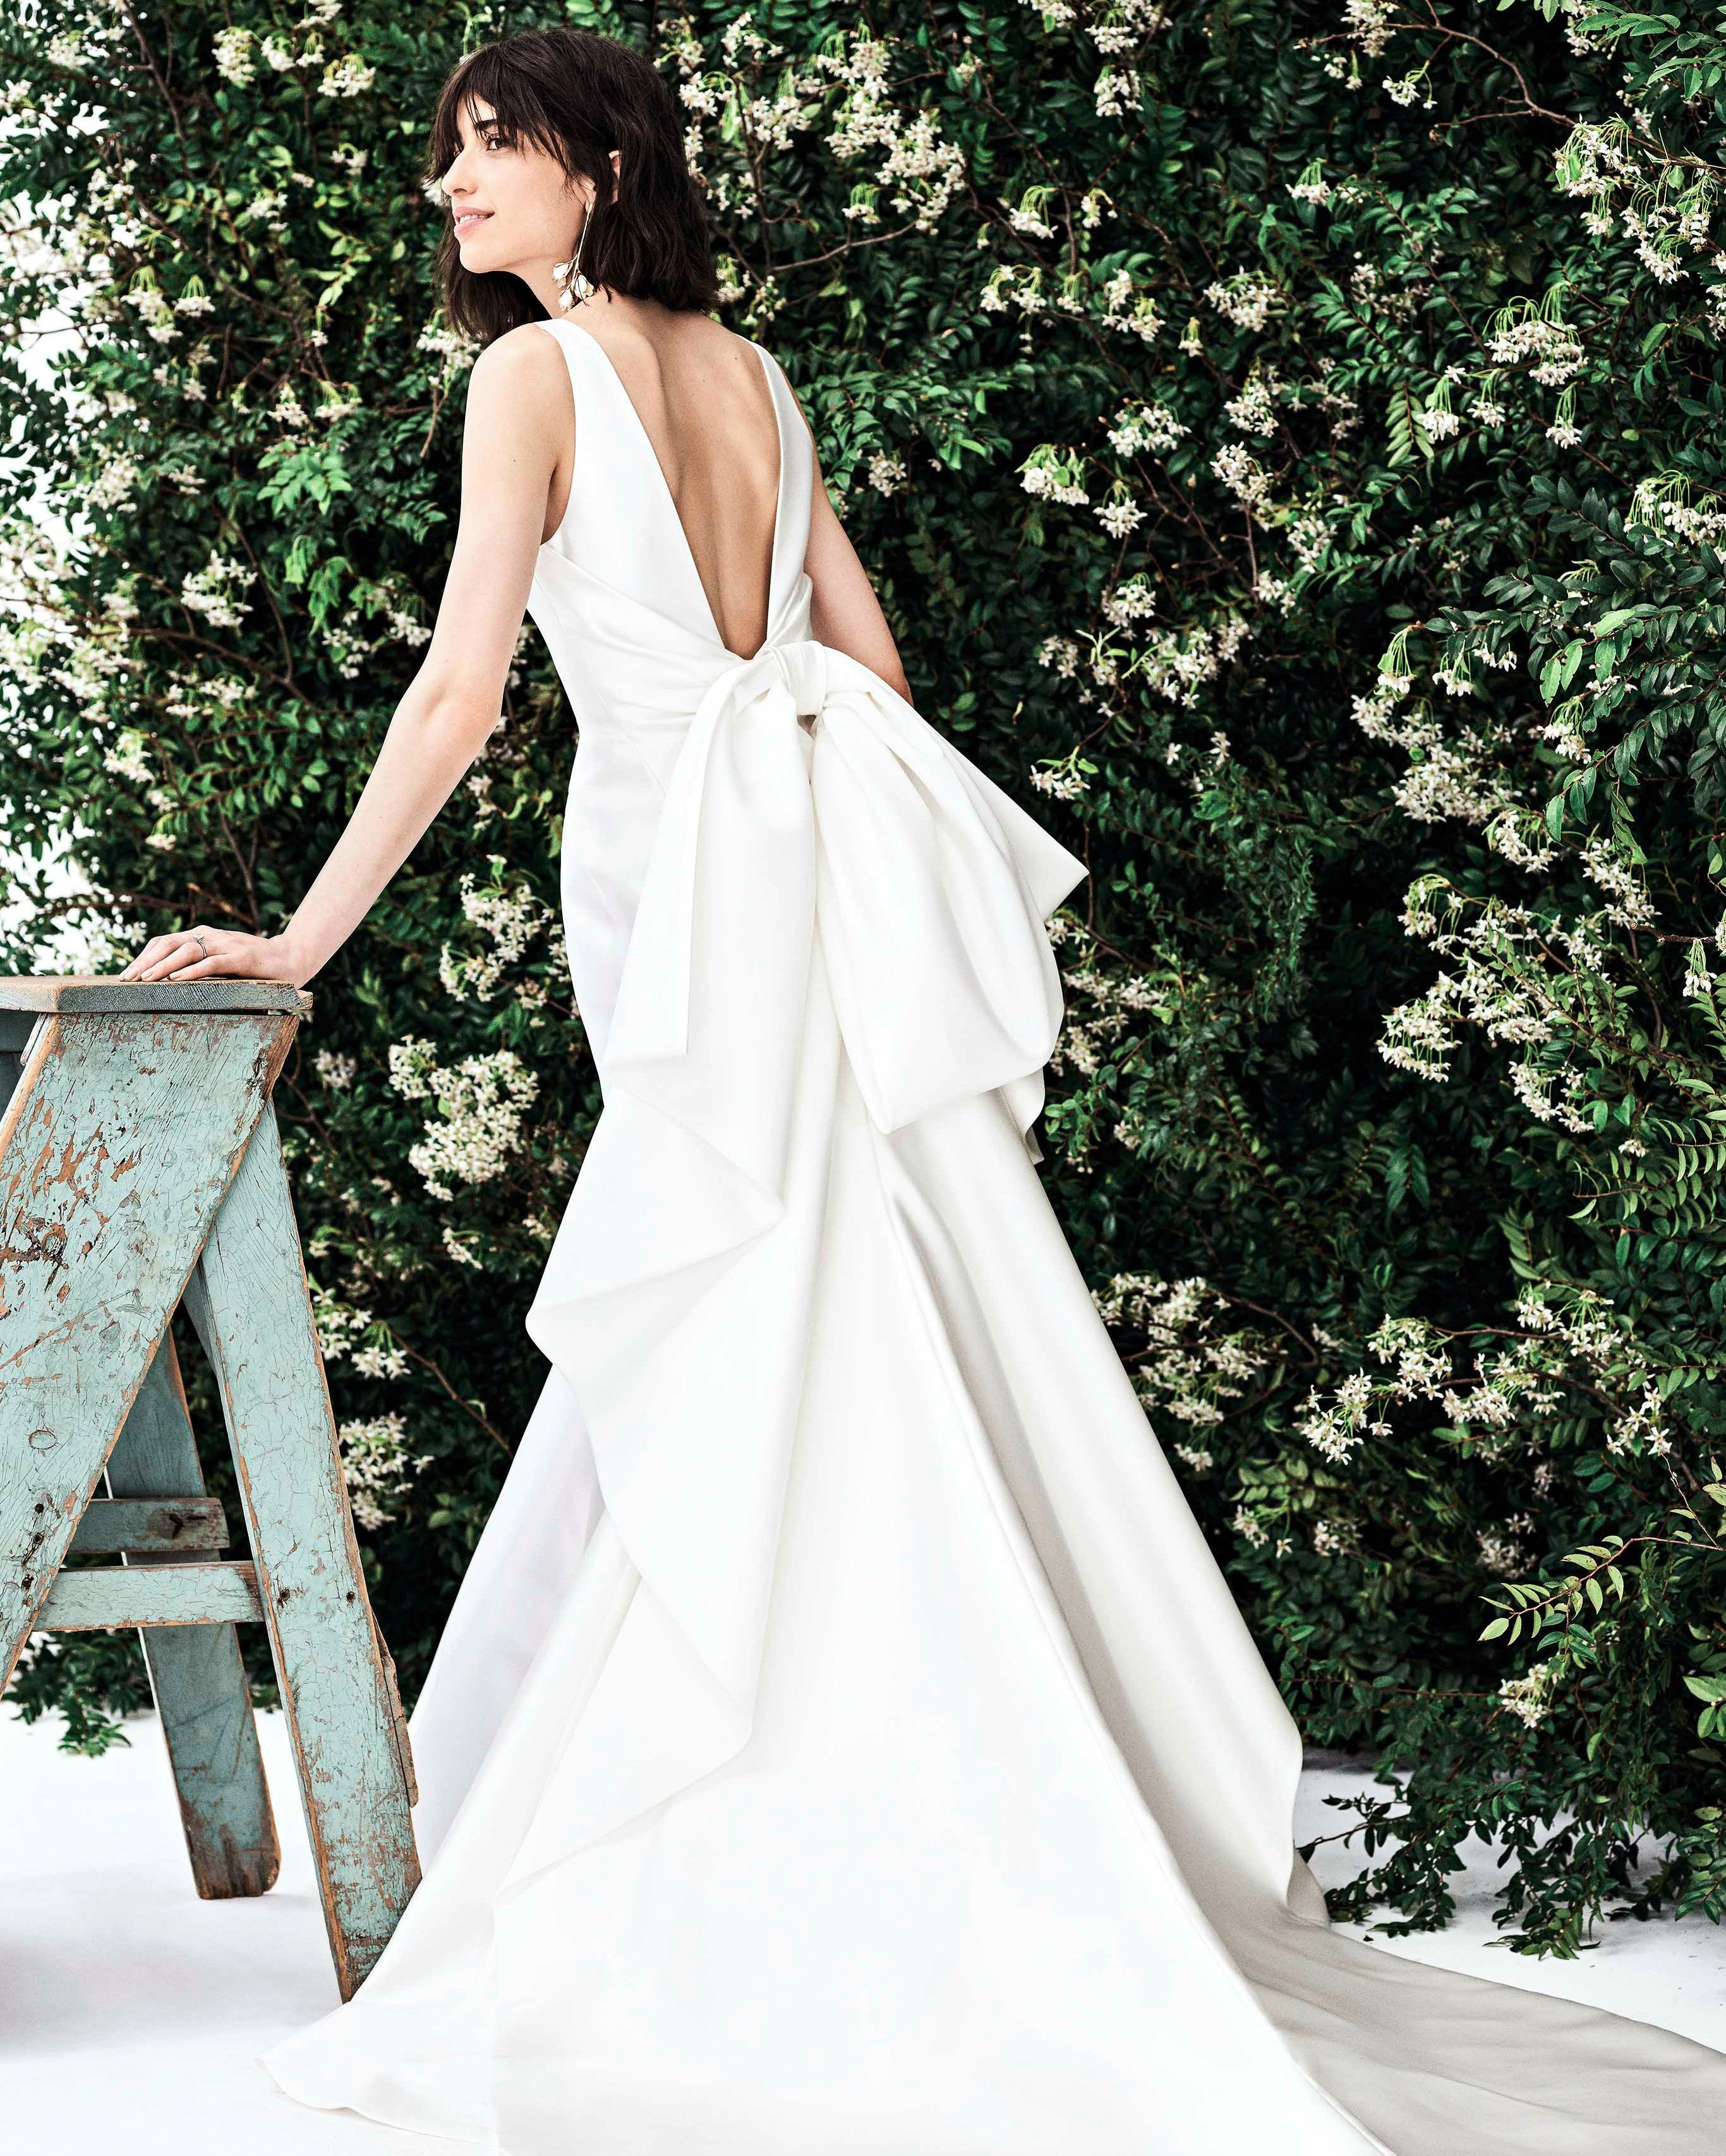 23bc592e38e9 Sleeveless mermaid weding dress with bow detail on back #Wedding #Bride  #Bridal #